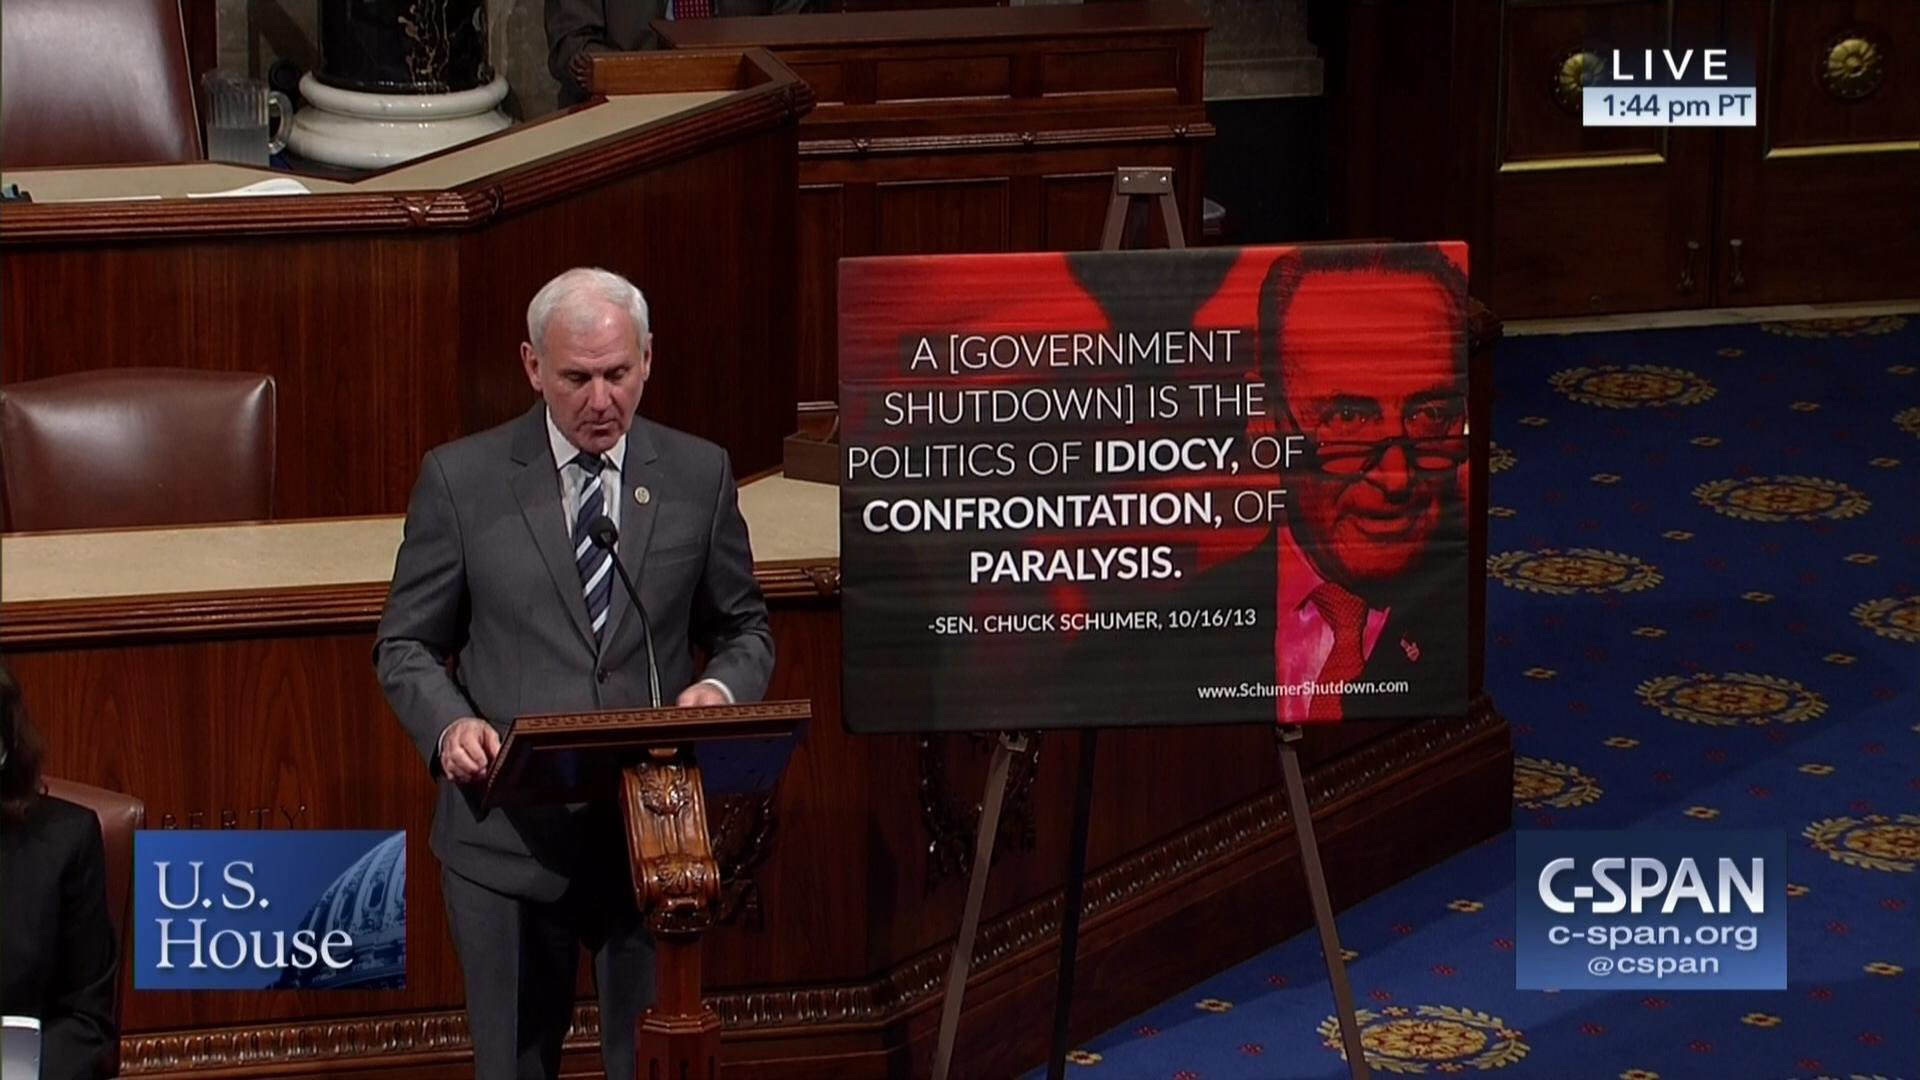 Dem forces vote on GOP lawmaker's poster slamming Schumer on House floor https://t.co/fV2MBP8wVQ https://t.co/WpSm6VlX3g